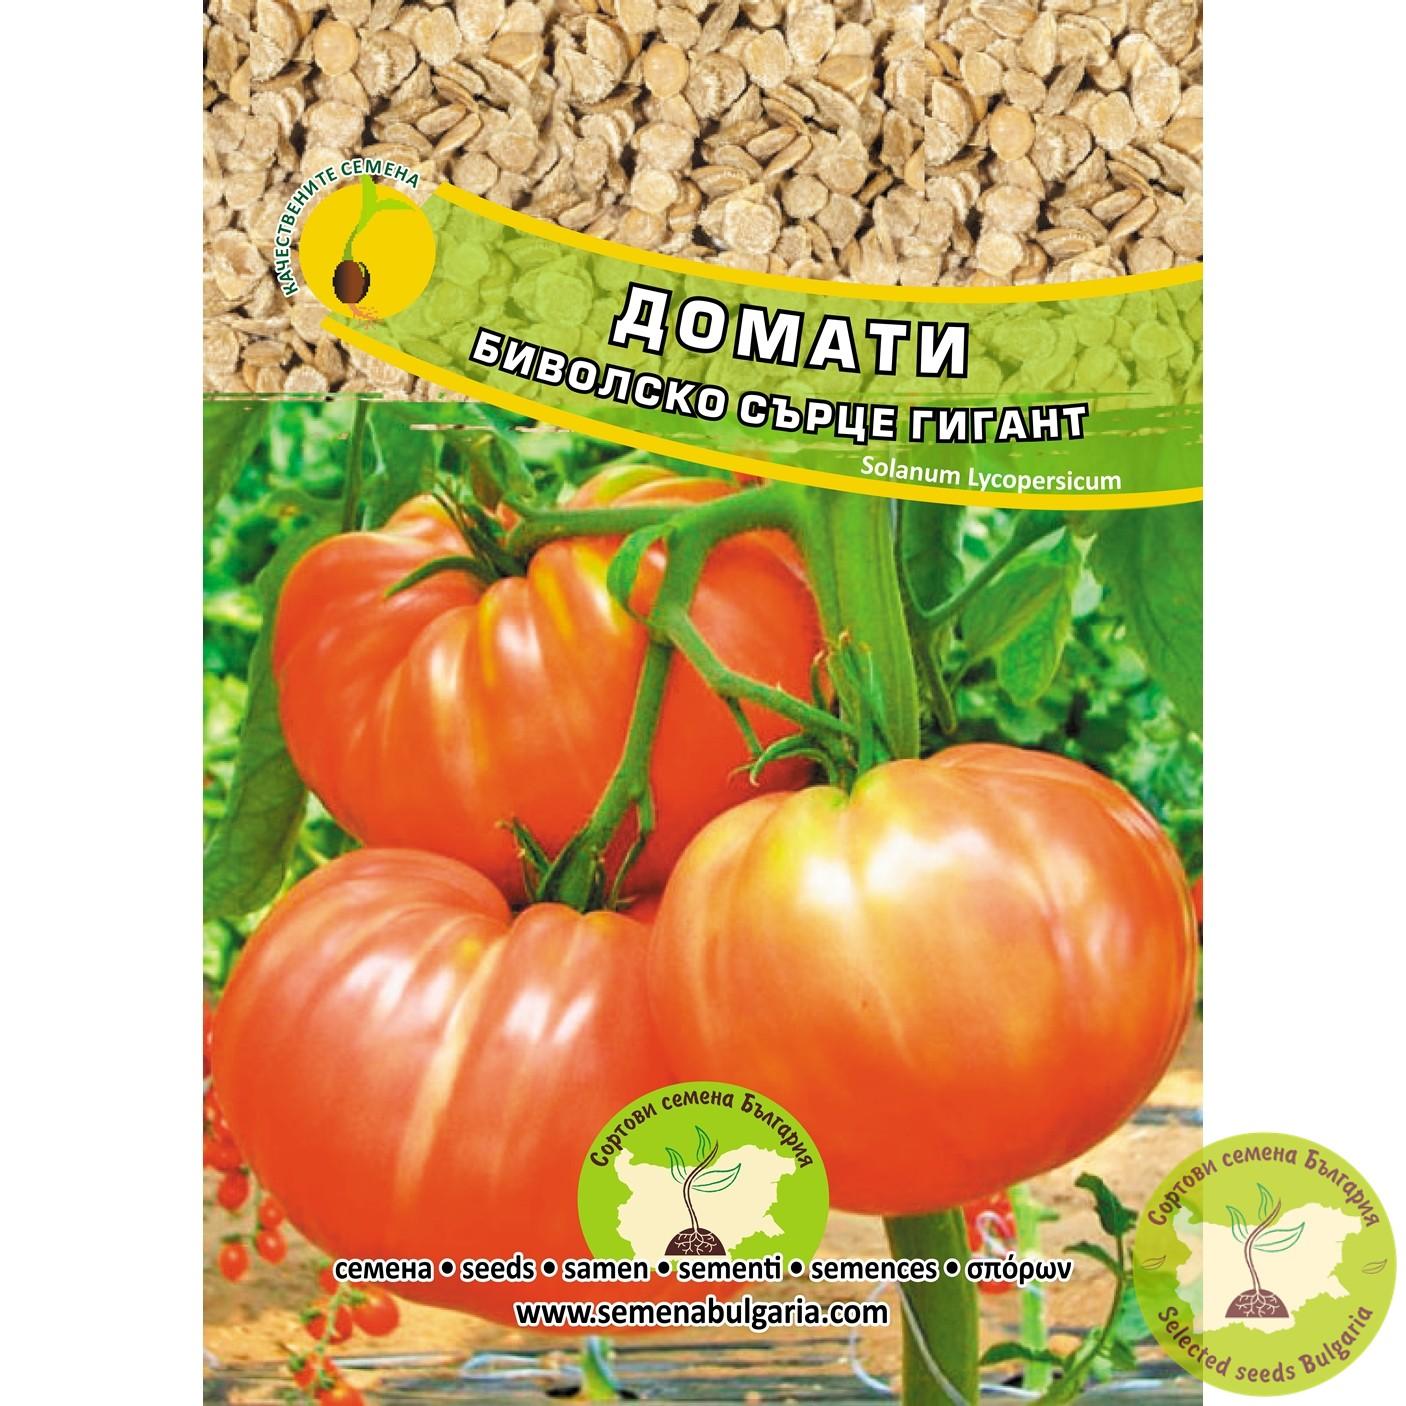 Семена домати Биволско сърце гигант